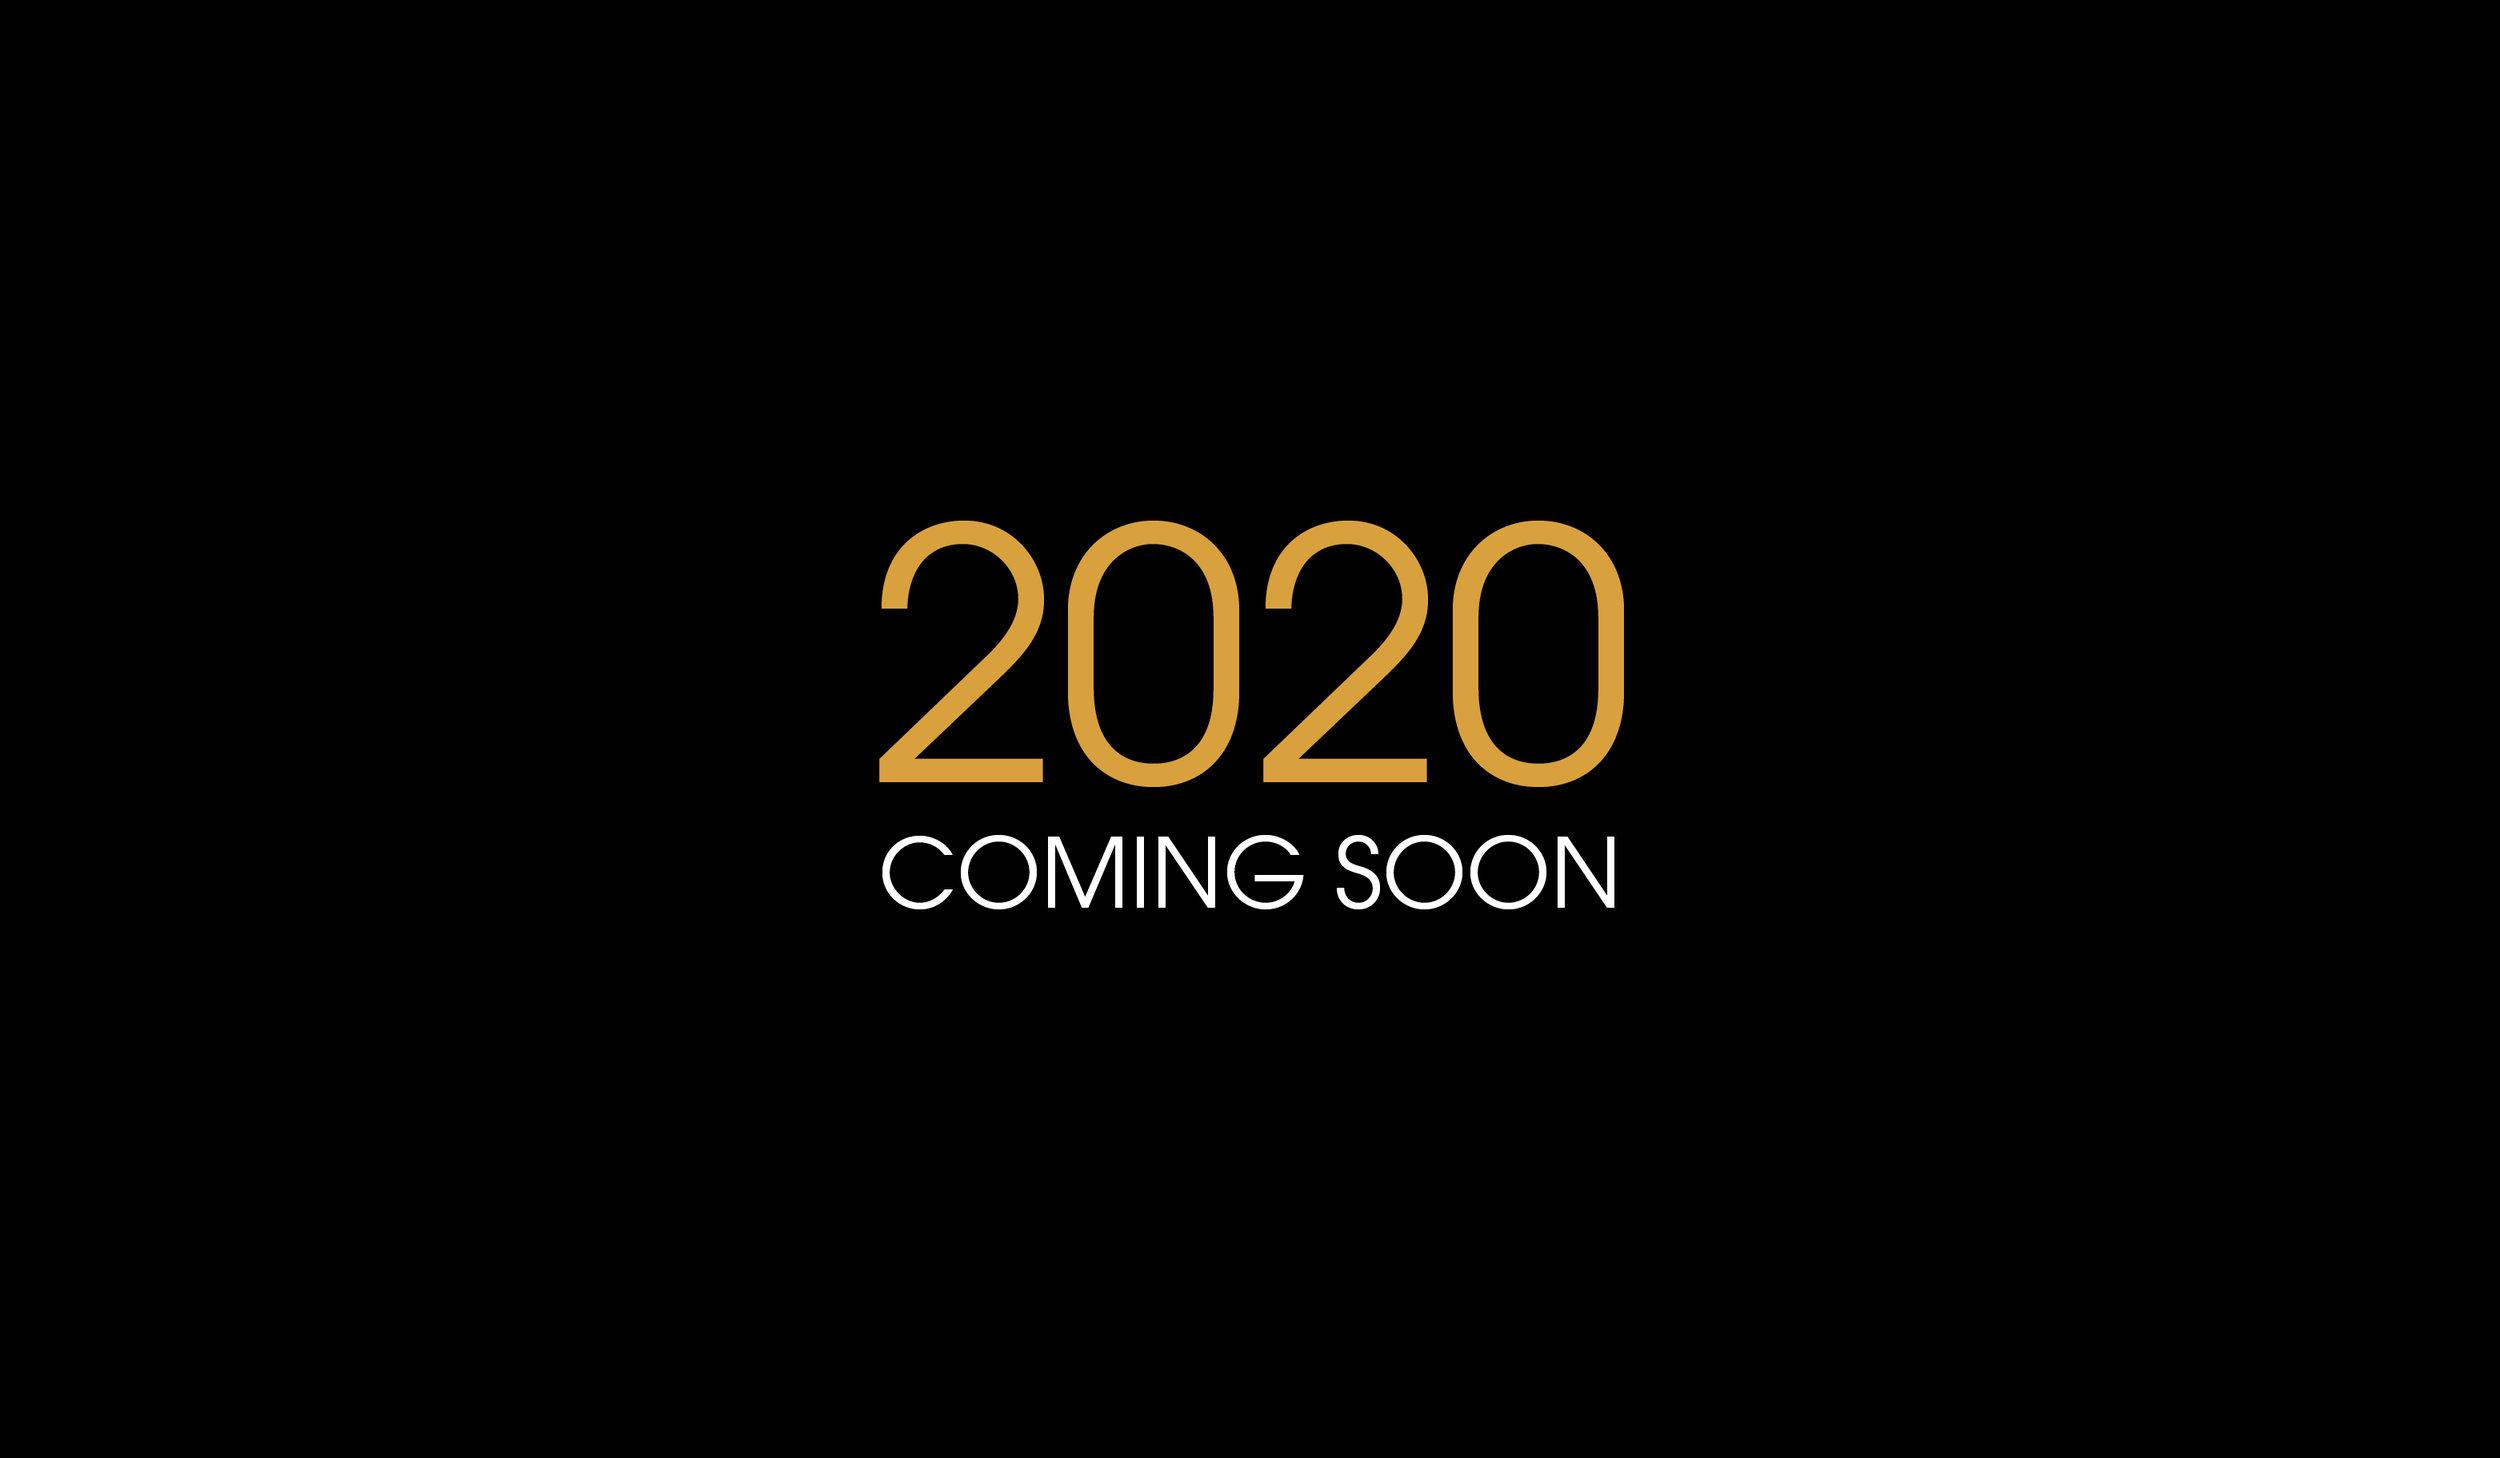 Team GB Ball 2020 logo - Coming soon